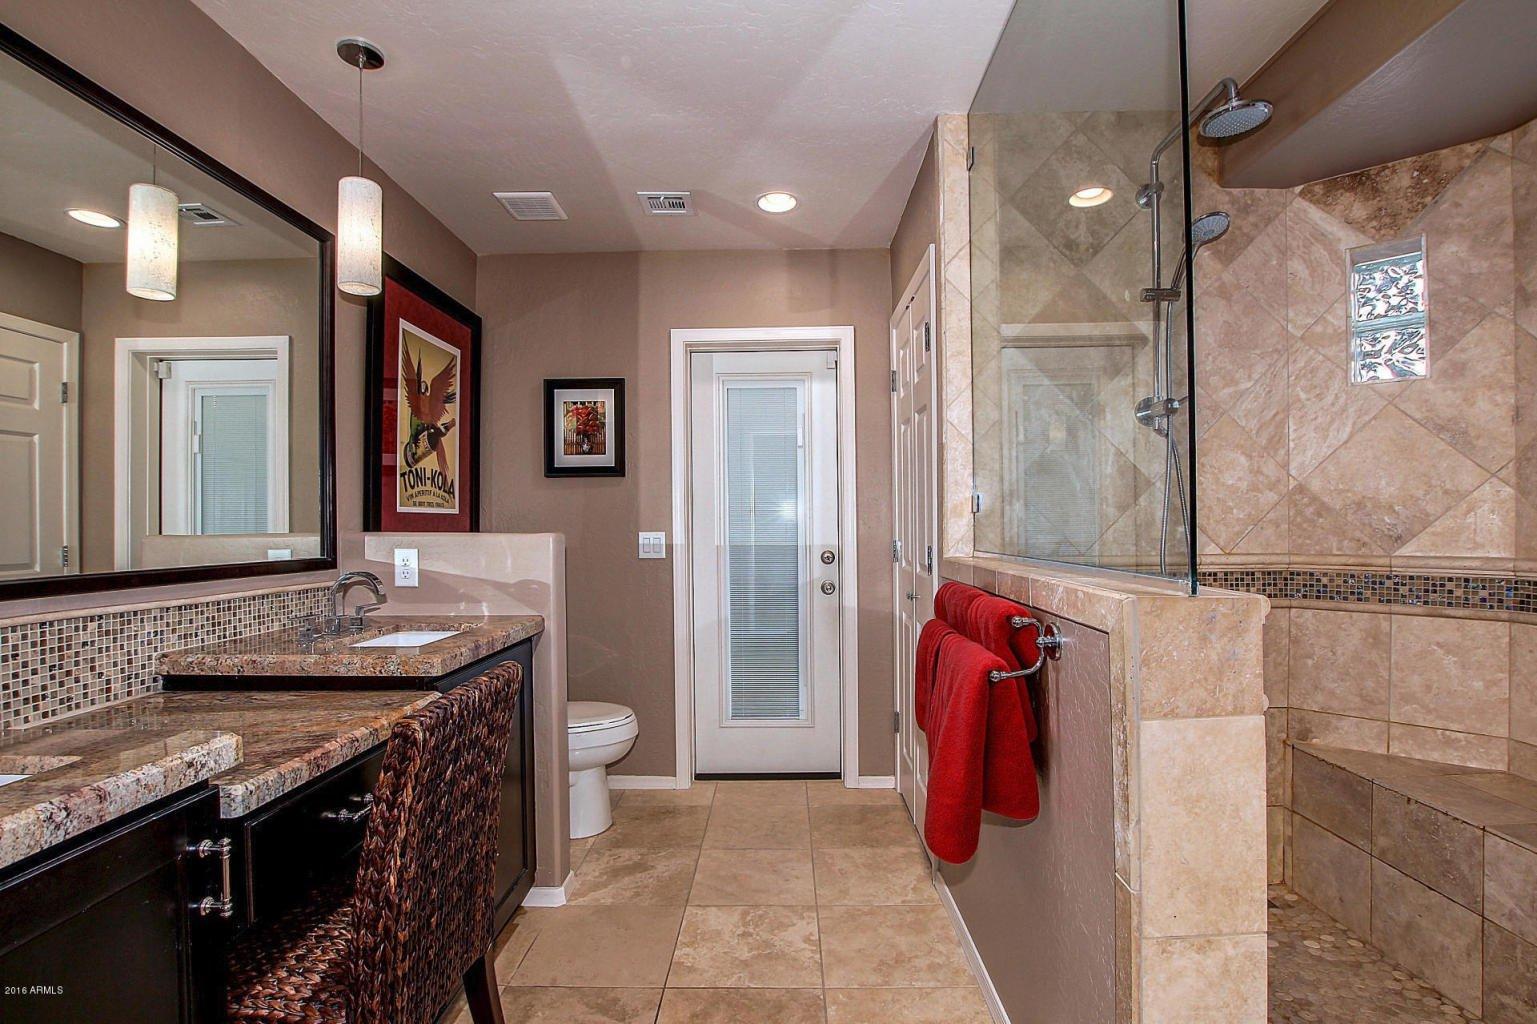 Photo 16: Photos: 3602 E Mountain Sky Avenue in Phoenix: Ahwatukee House for sale : MLS®# 5462780